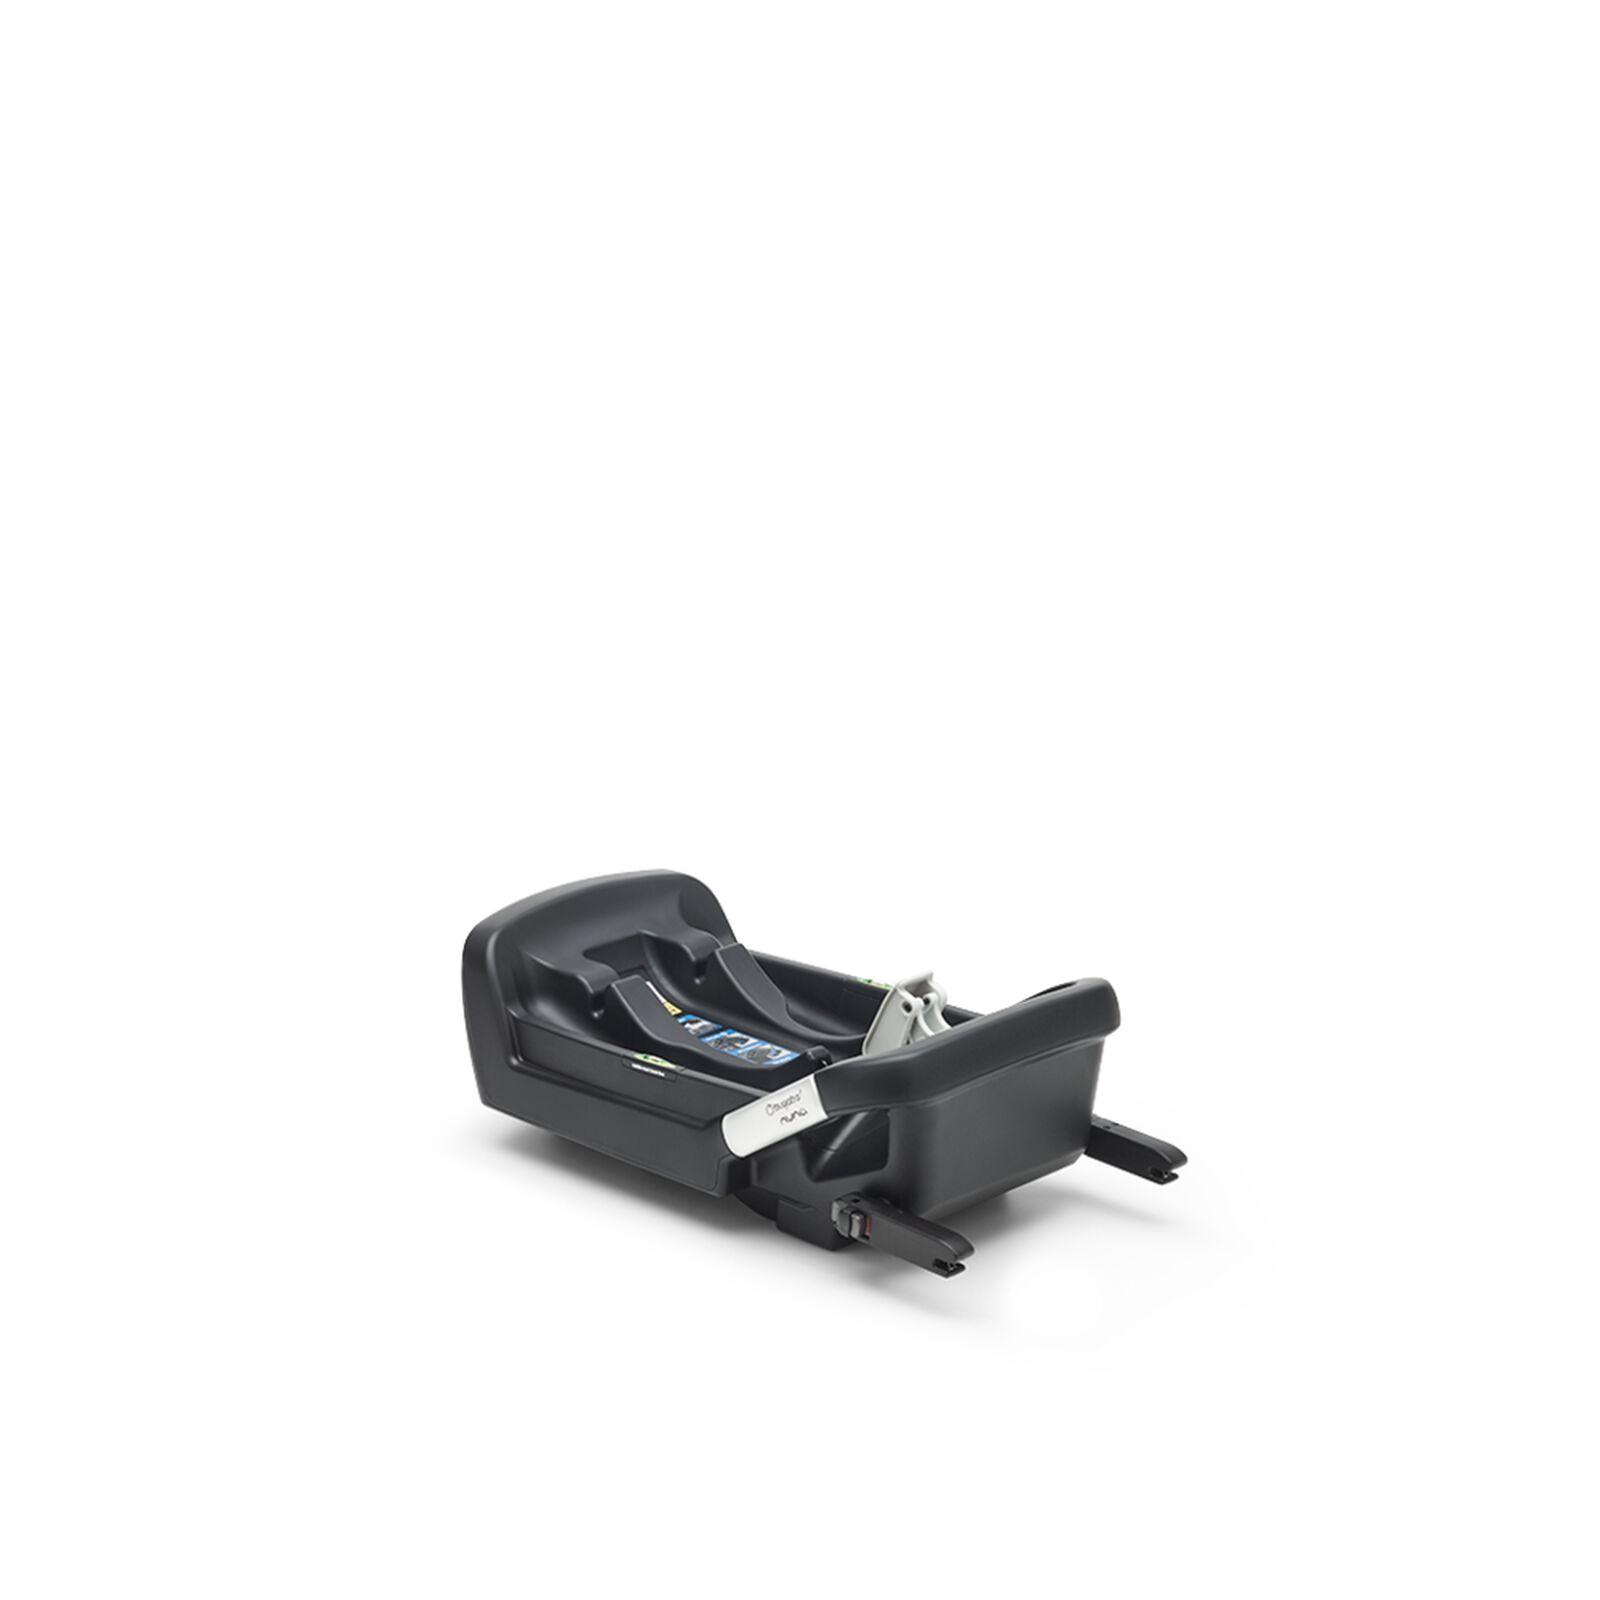 Original Turtle by Nuna car seat with base